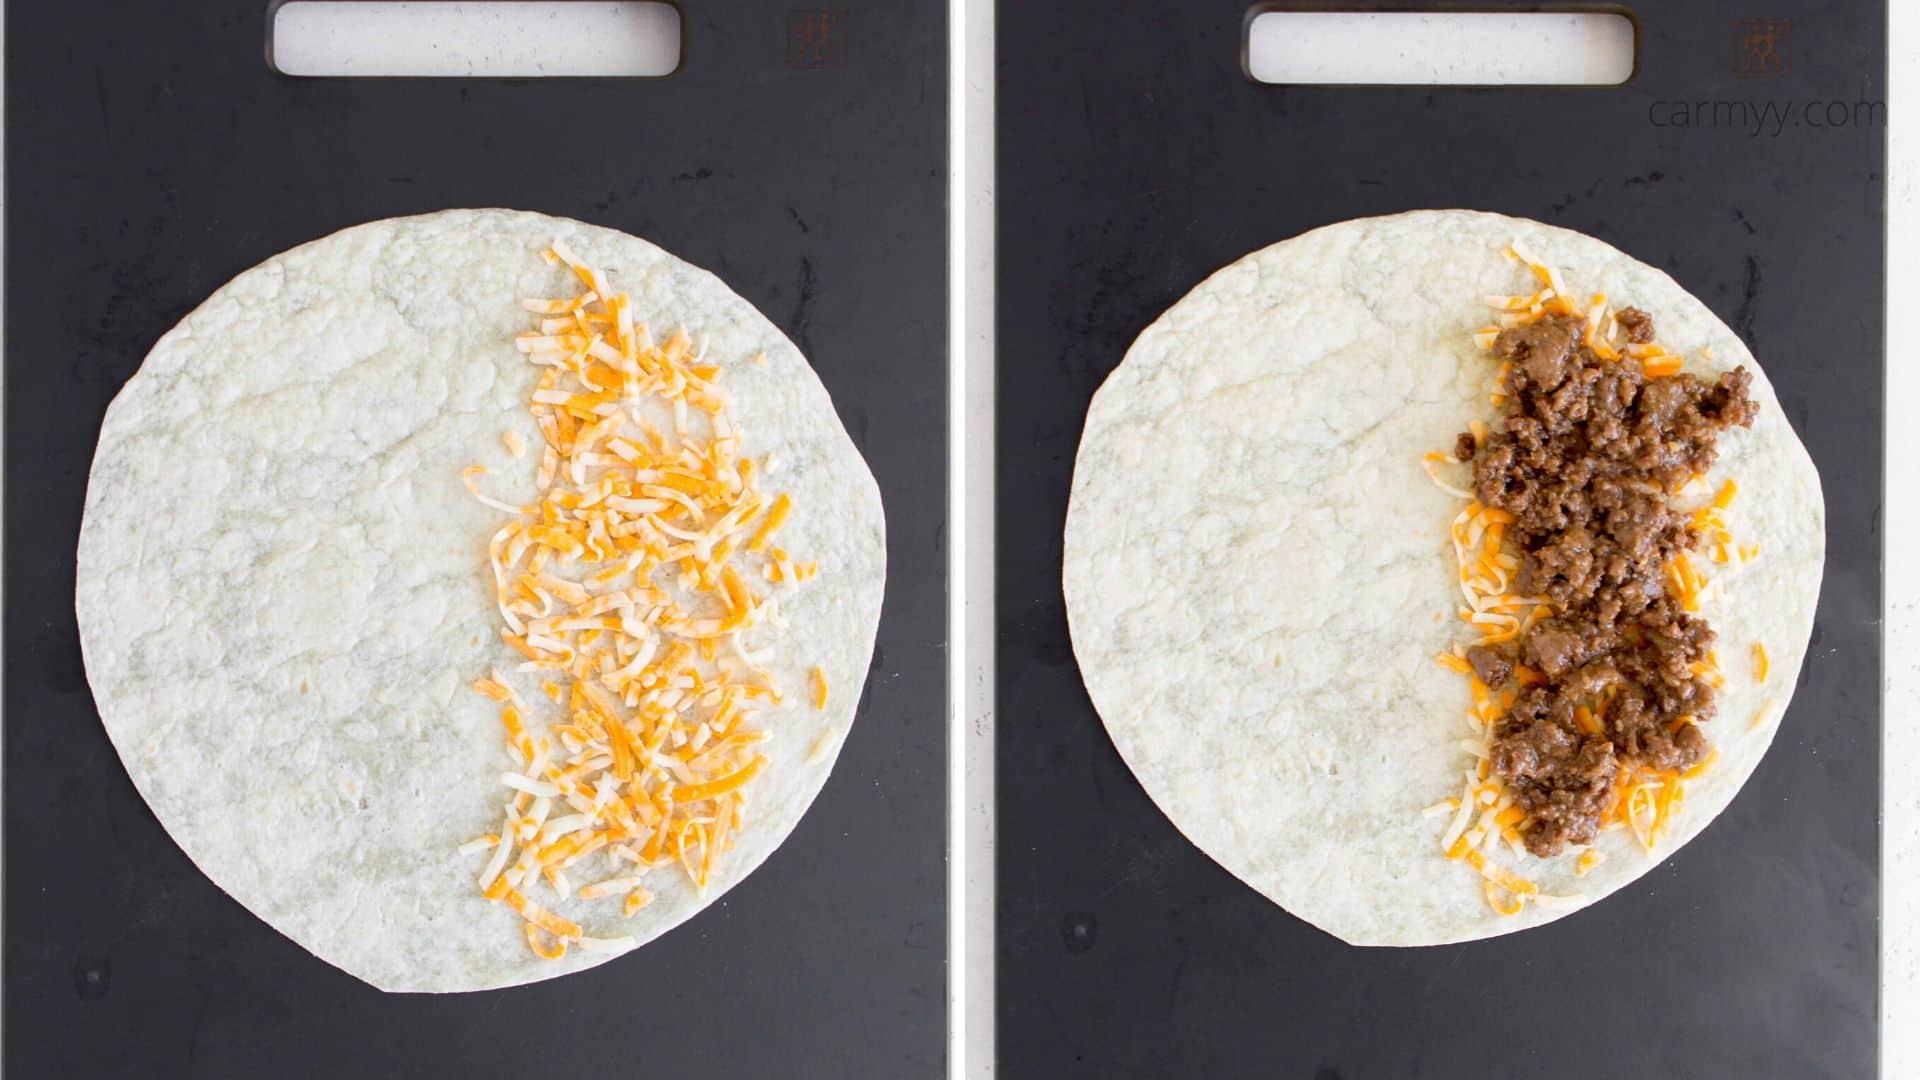 mettre la quesadilla dans les tortillas